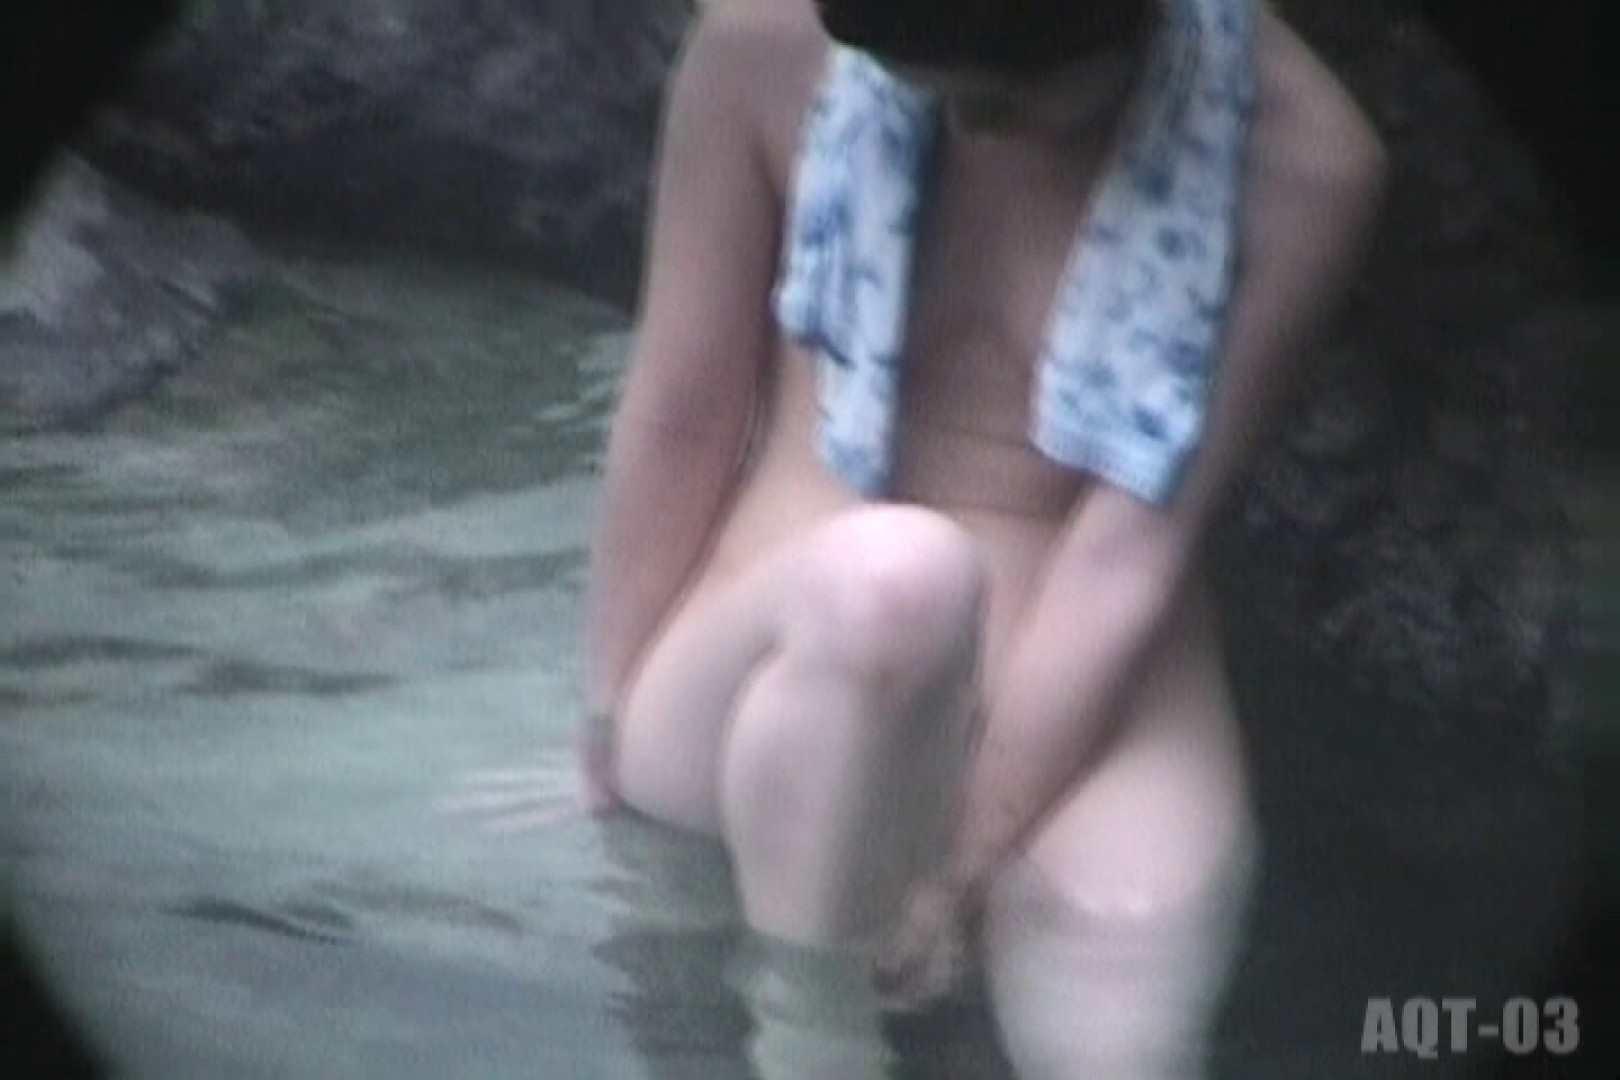 Aquaな露天風呂Vol.736 盗撮 エロ無料画像 60画像 26